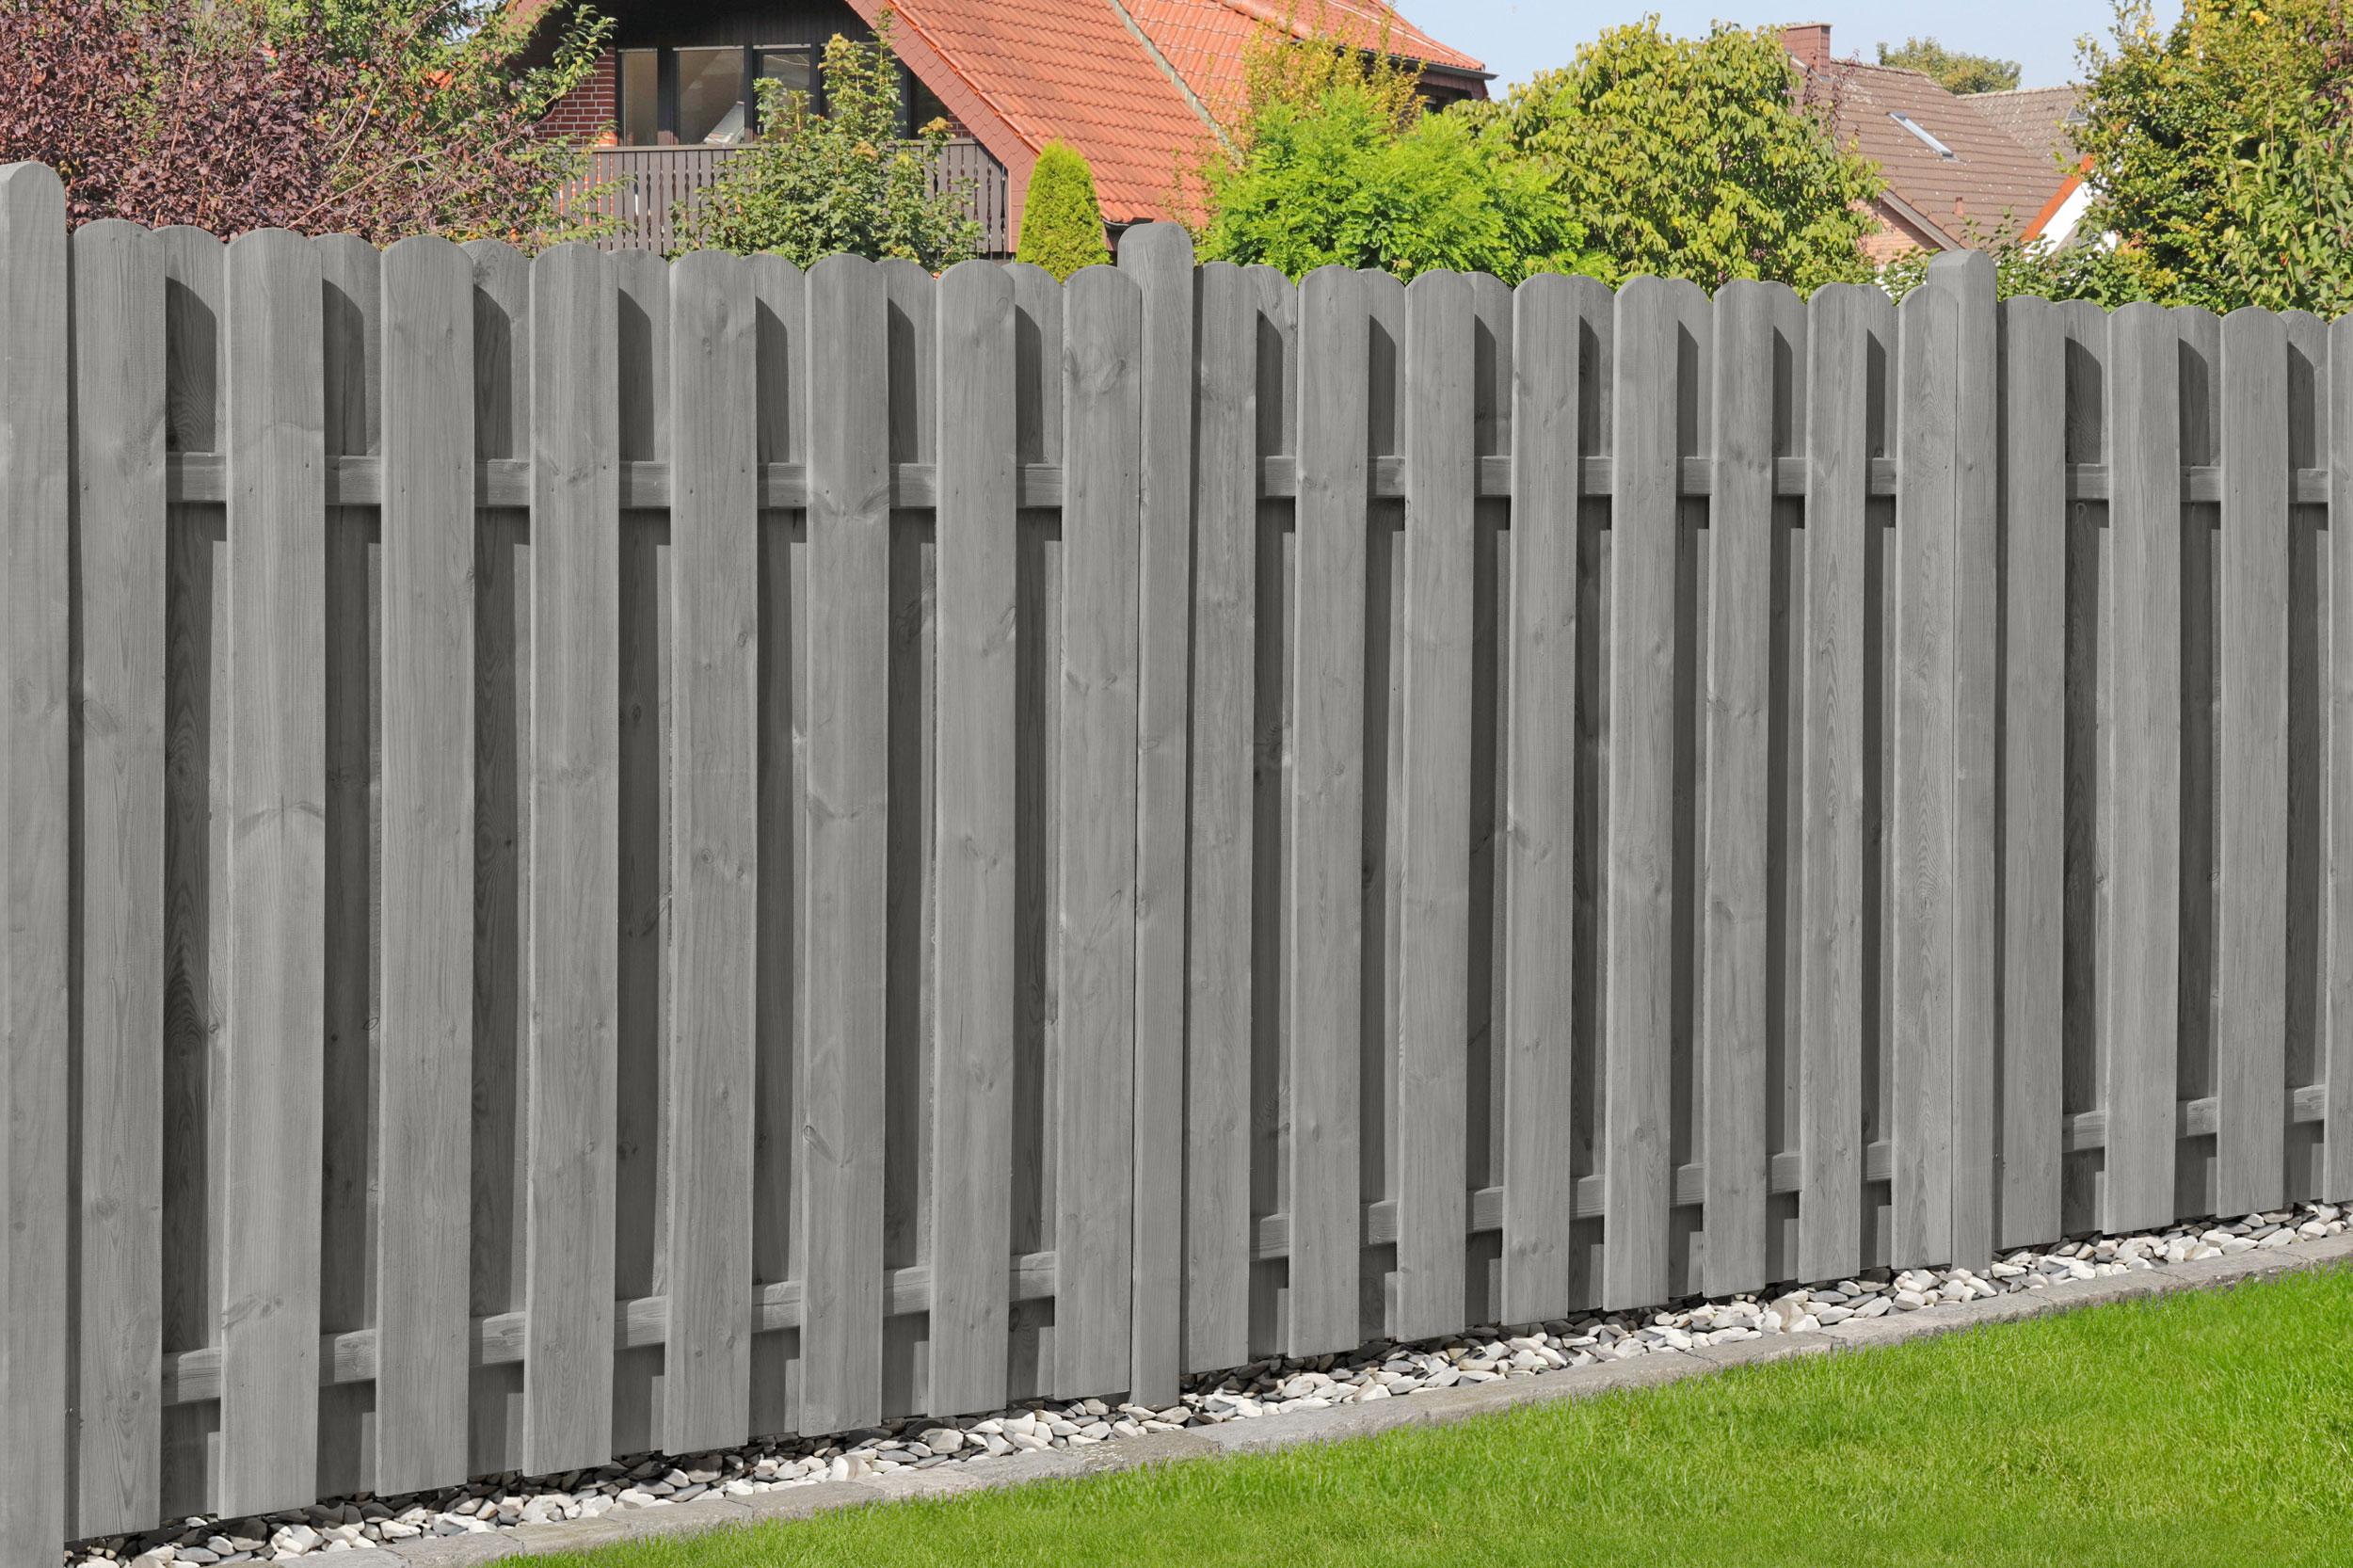 Sichtschutzzaun Bohlenzaun Element Holz Ki Grau 90x180cm Bei